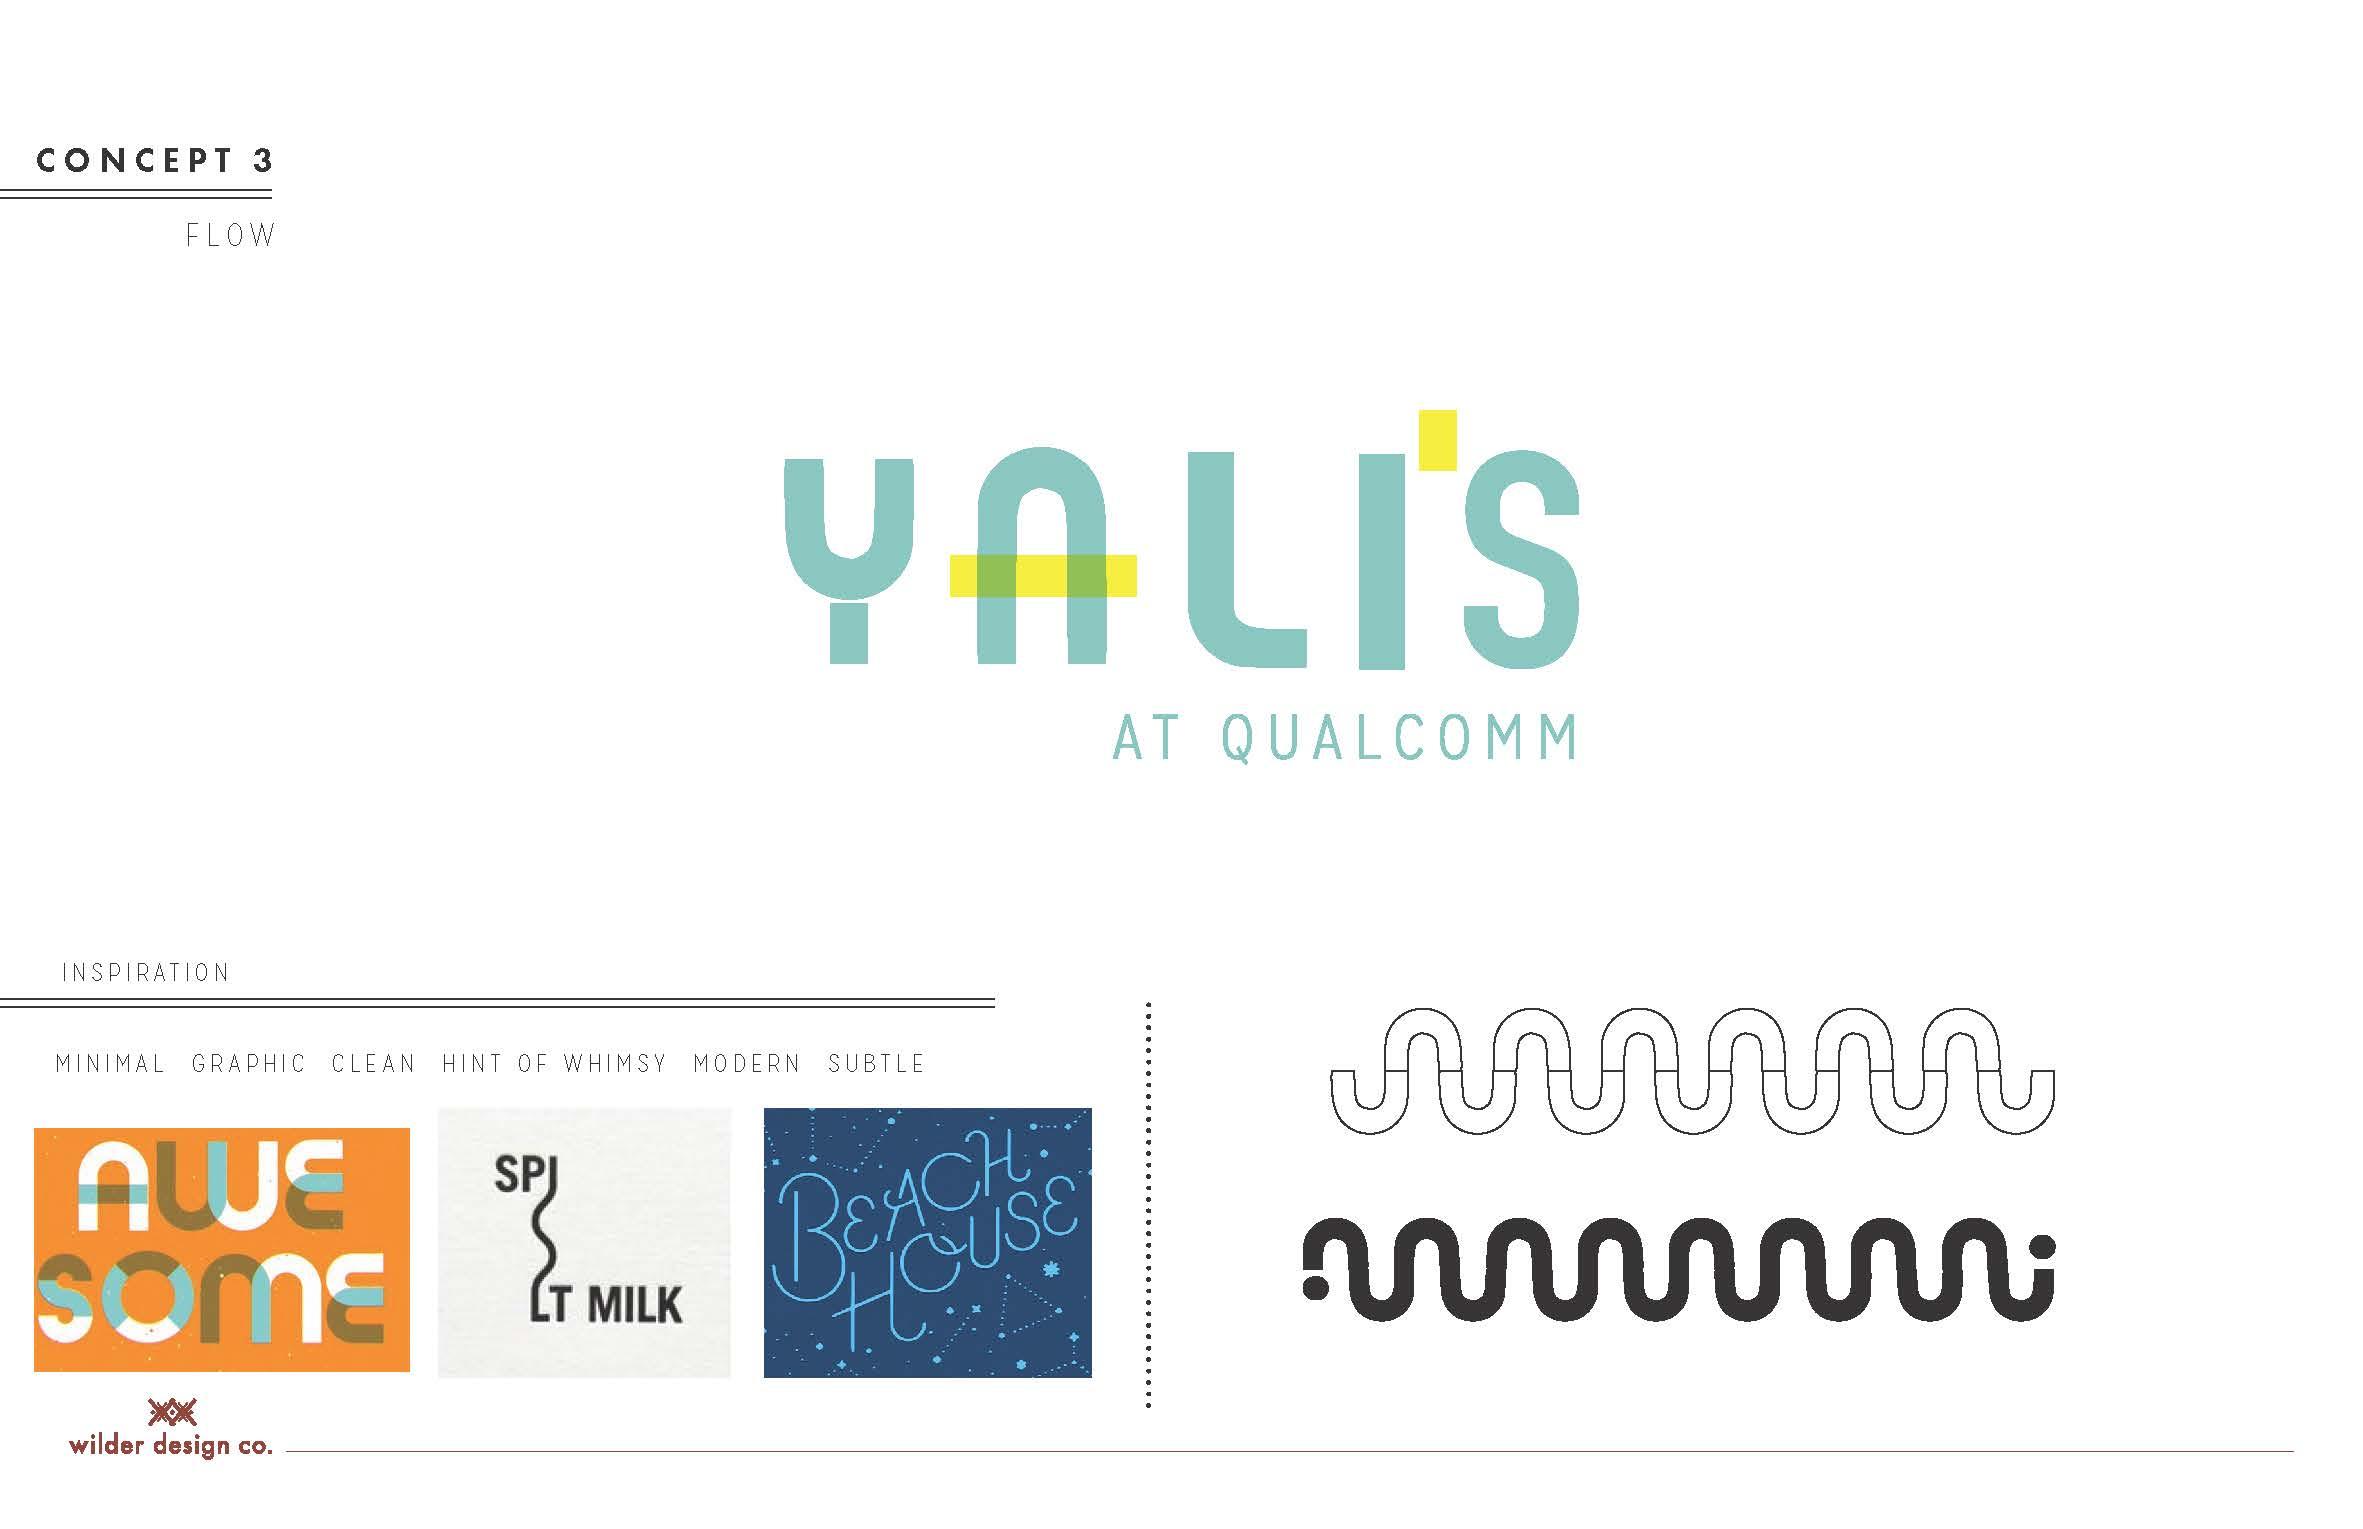 Yalis_Branding_Rd1_090117_v1_Page_7.jpg